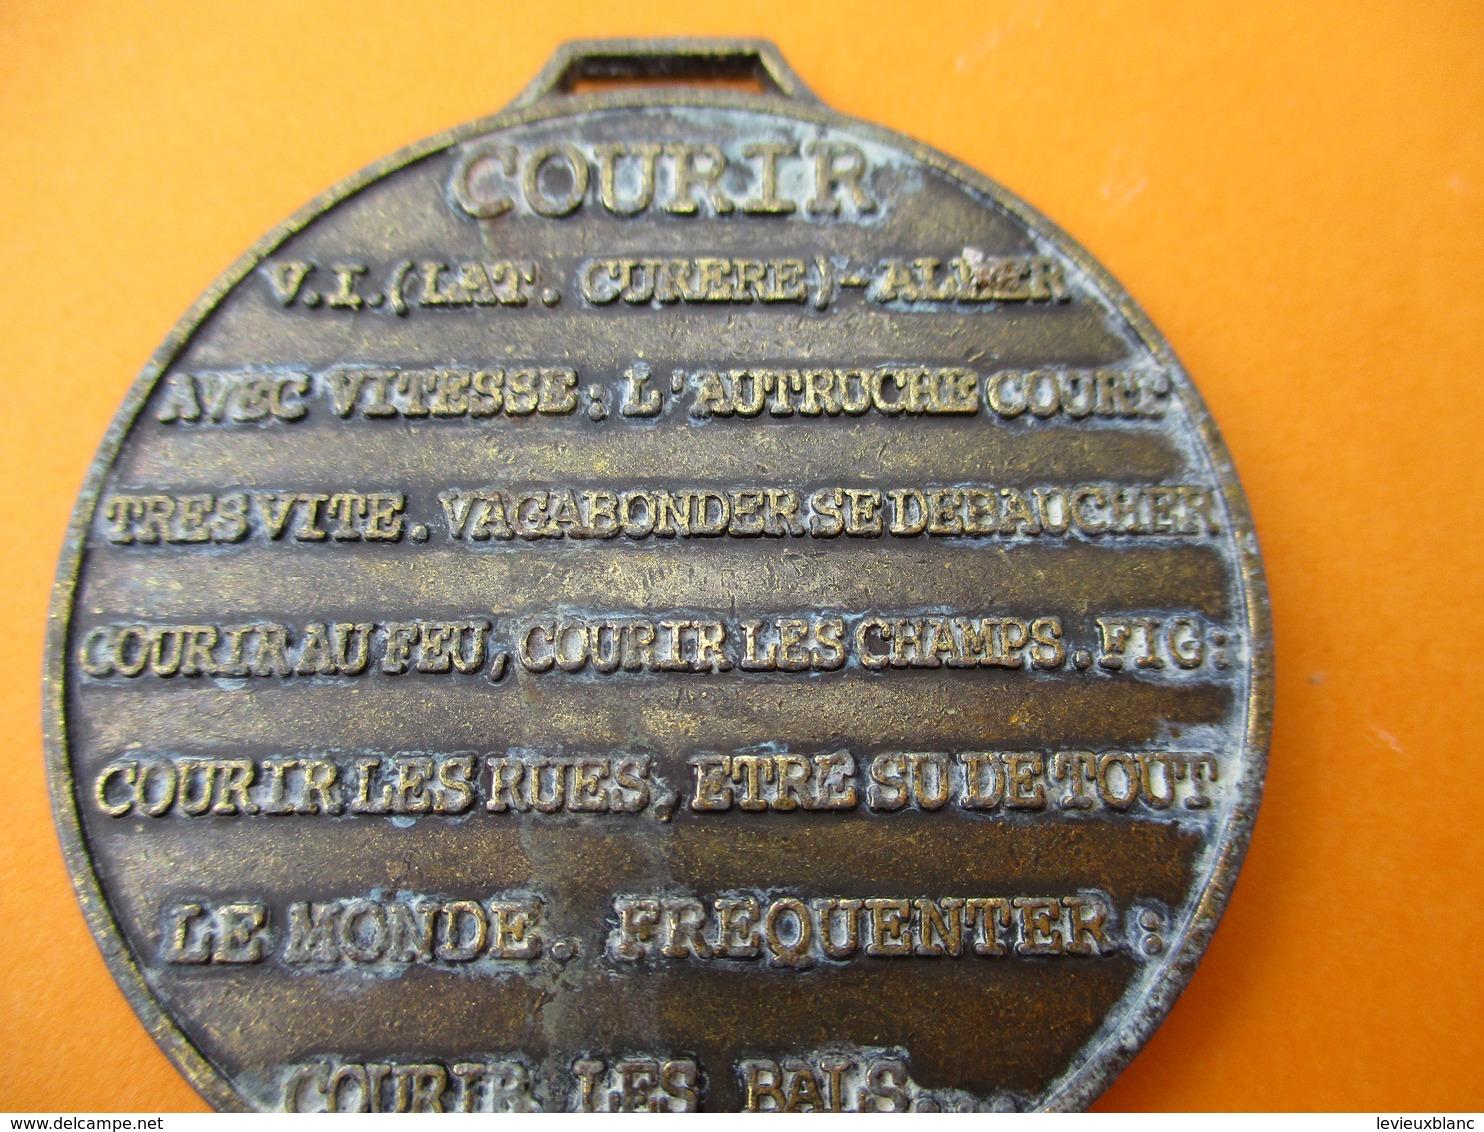 Marche /21éme PARIS-VERSAILLES/1976-1996/ Courir/Bronze Nickelé /Arthus Bertrand/ Fabrice/1996                    SPO260 - Sports